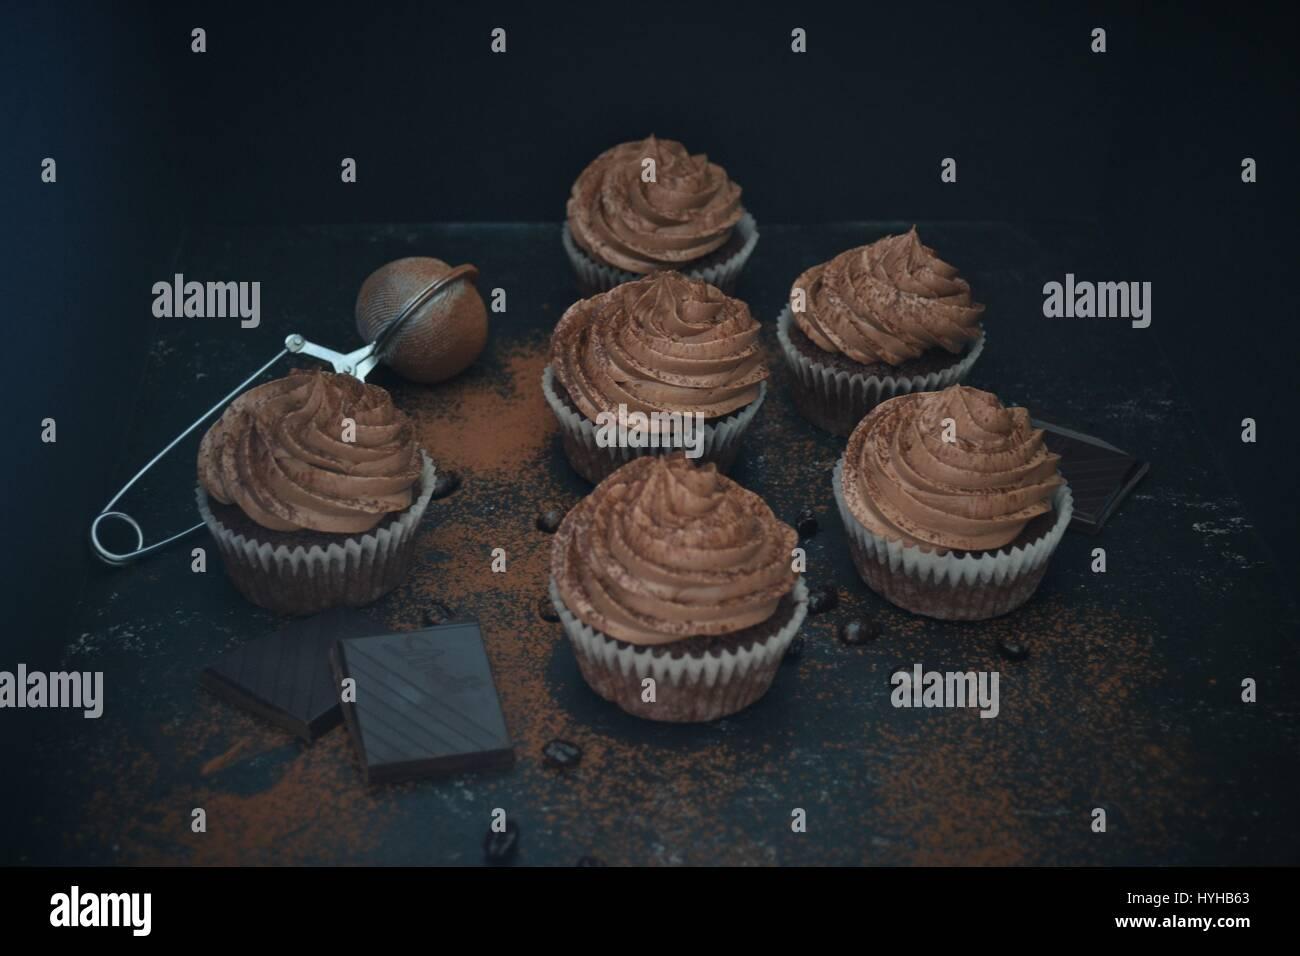 Chocolate Coffee Mocca Cupcake - Stock Image